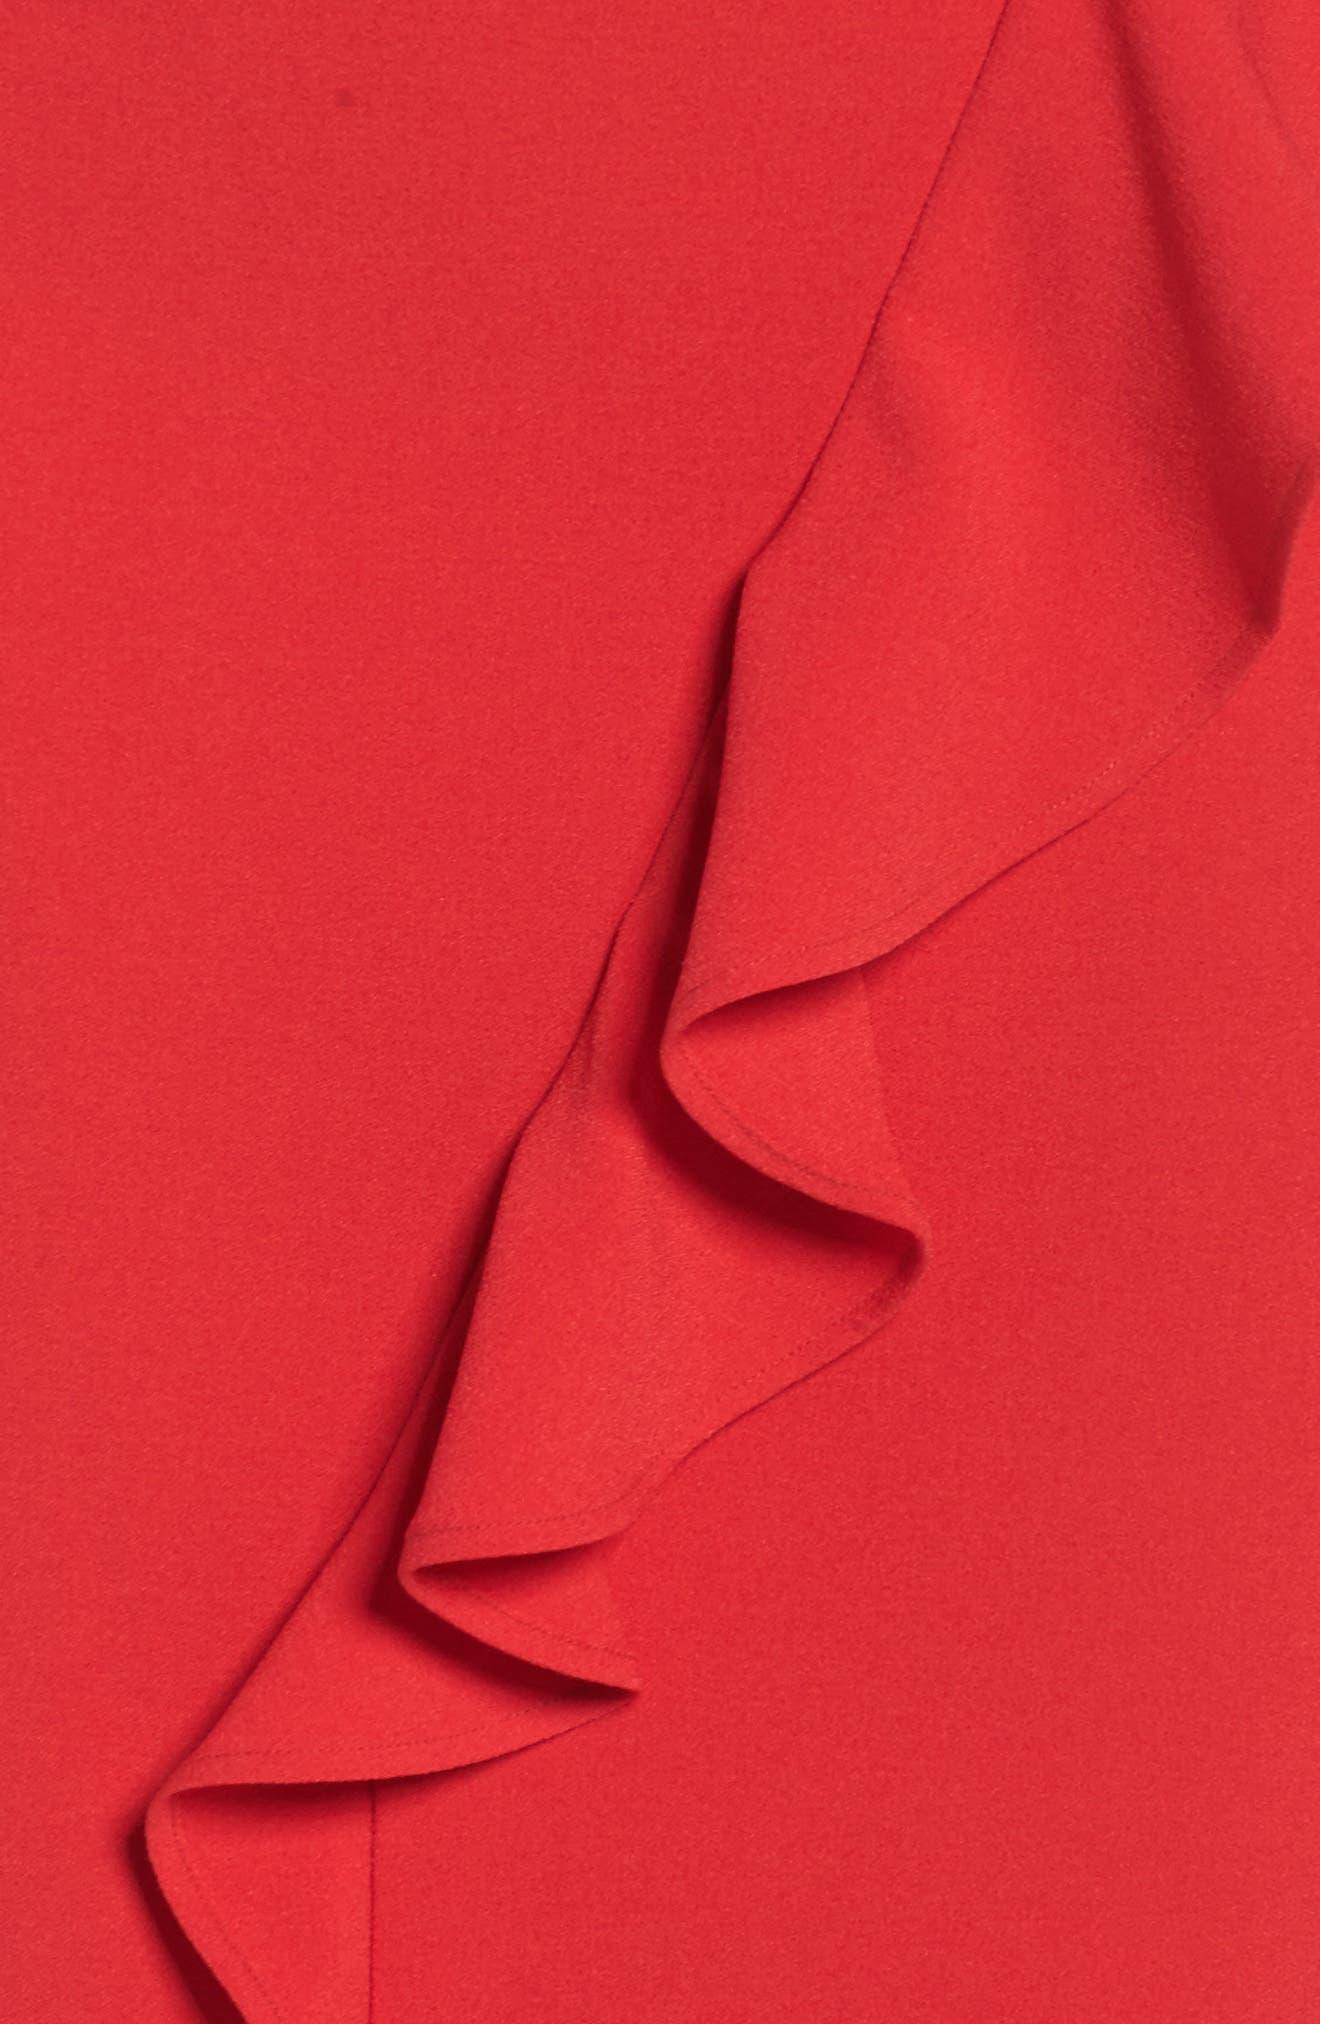 Ruffle Sheath Dress,                             Alternate thumbnail 5, color,                             610